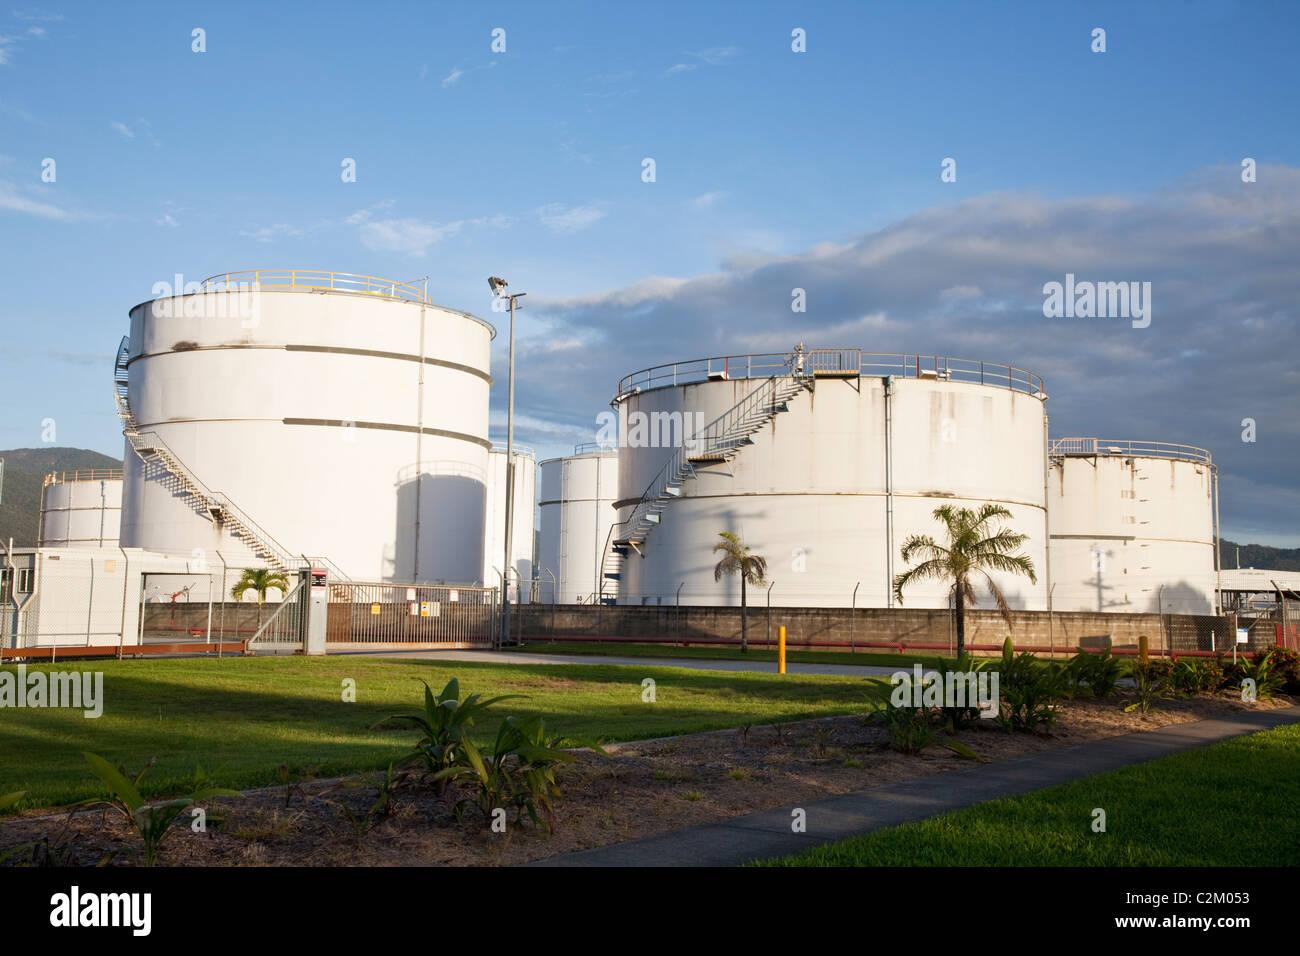 Fuel storage tanks at Portsmith. Cairns, Queensland, Australia - Stock Image